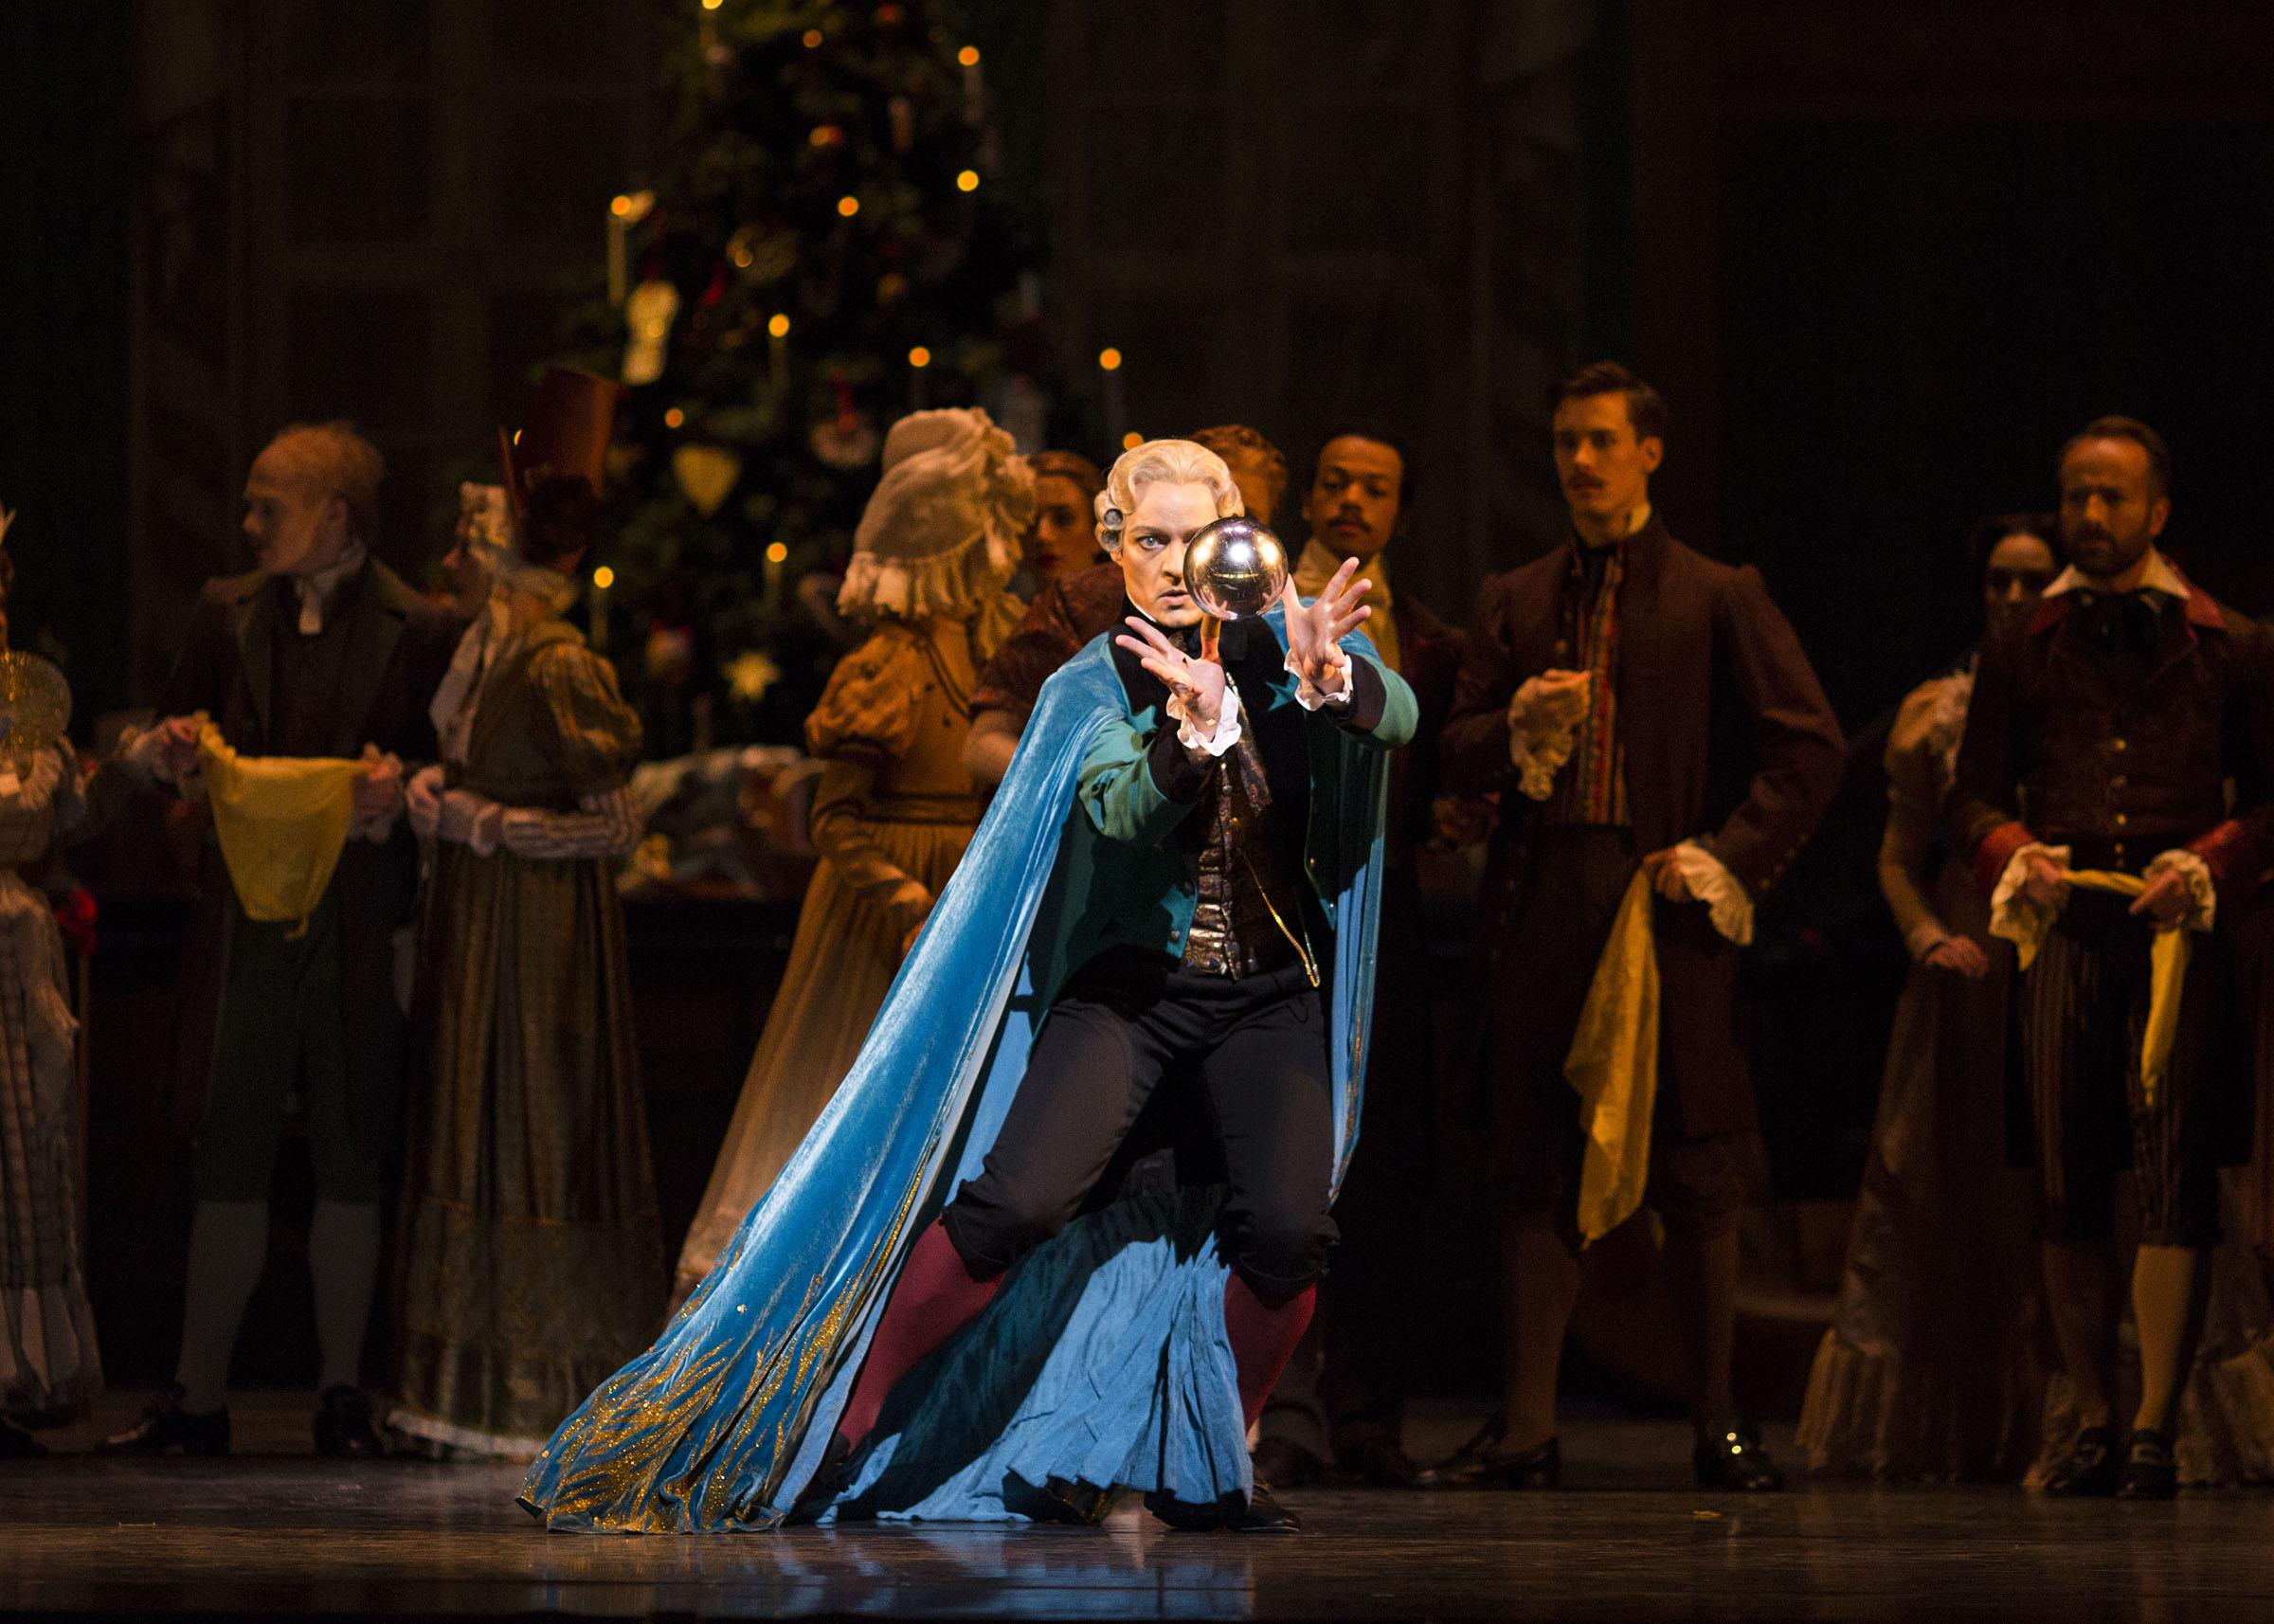 The Nutcracker by the Royal Ballet